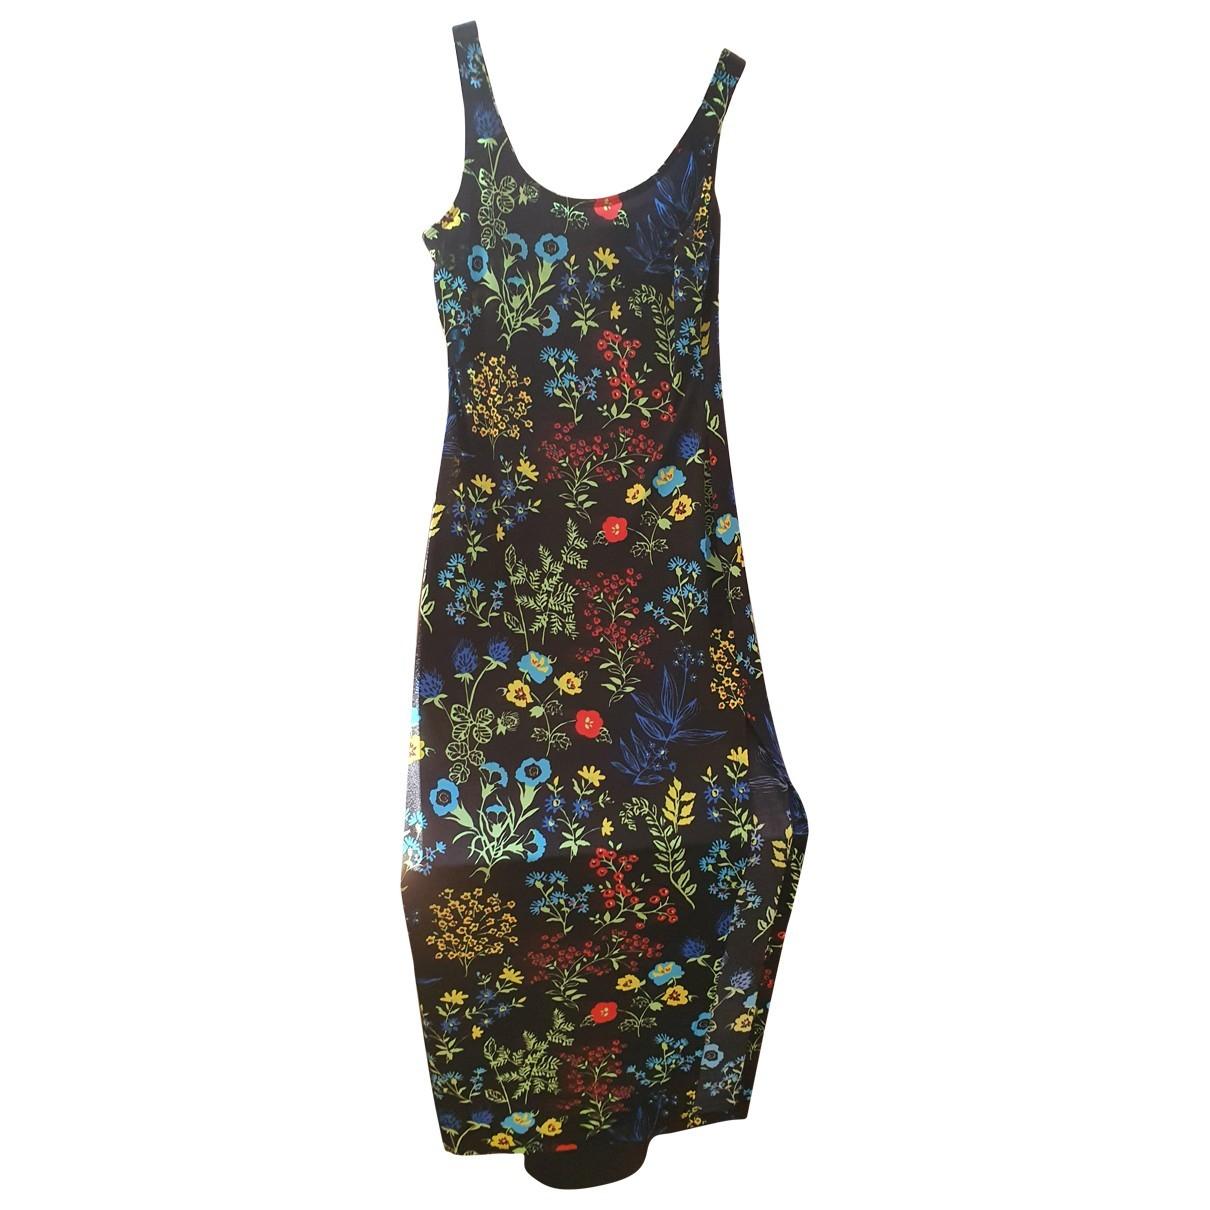 Versace Jeans \N Kleid in  Schwarz Polyester